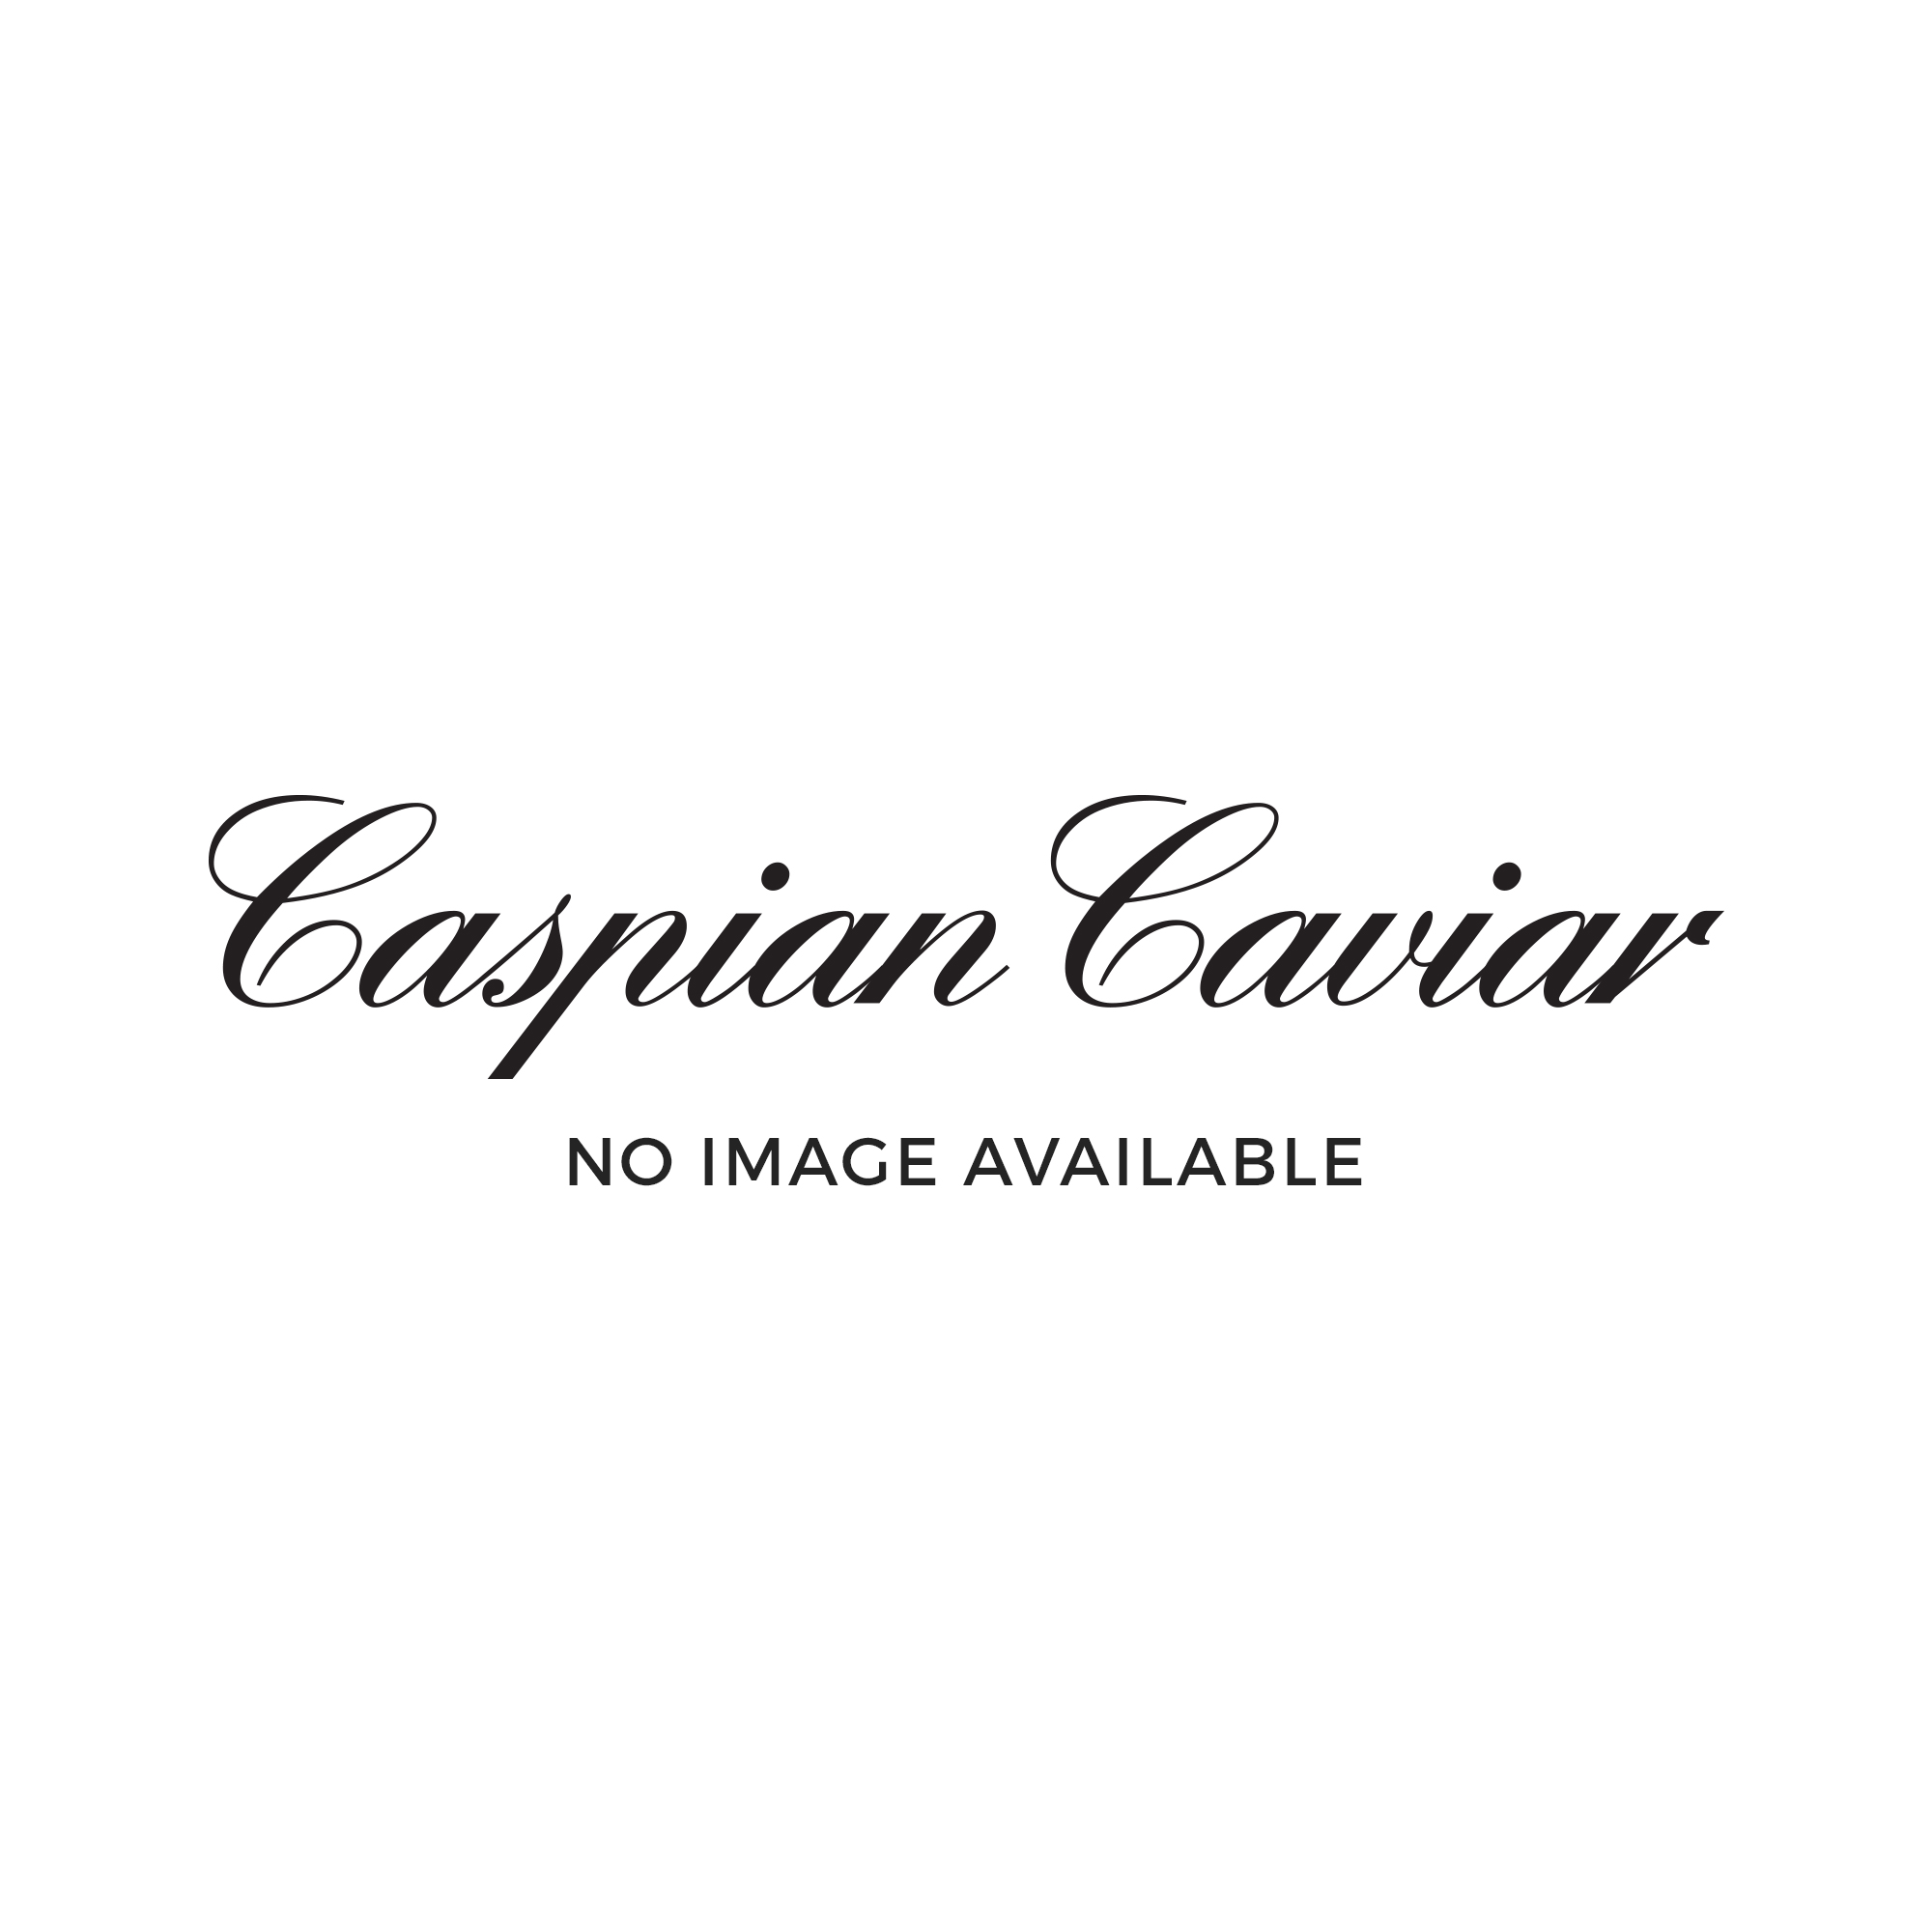 Caspian Caviar Really Super Hamper